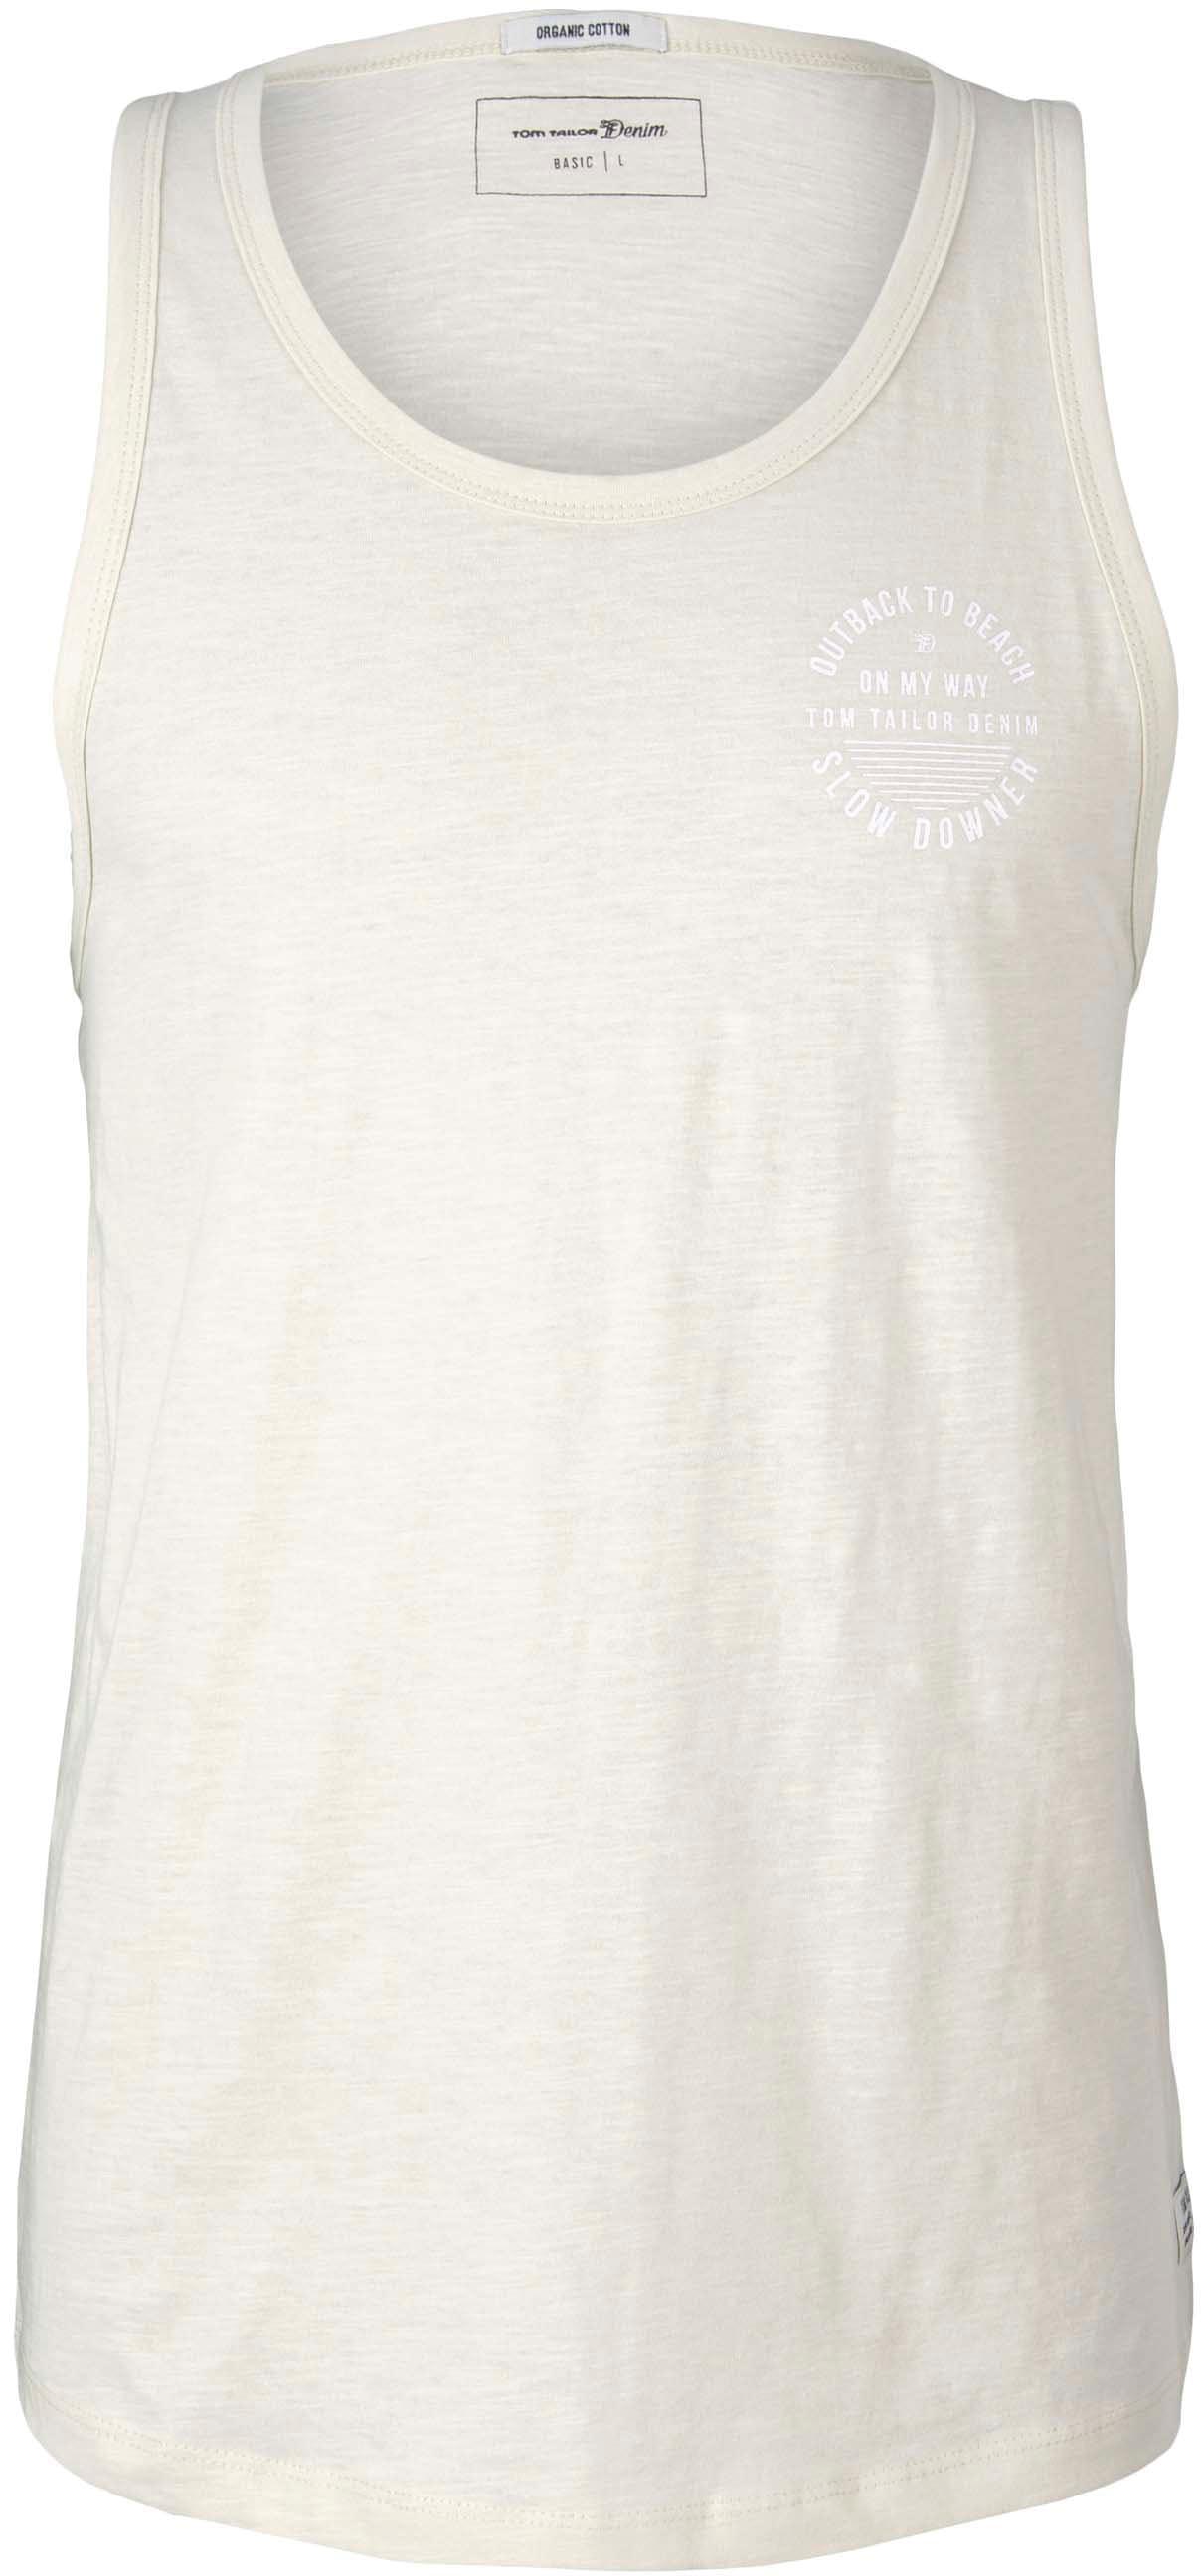 tom tailor denim -  Muskelshirt, mit großem Logo-Print auf der Brust